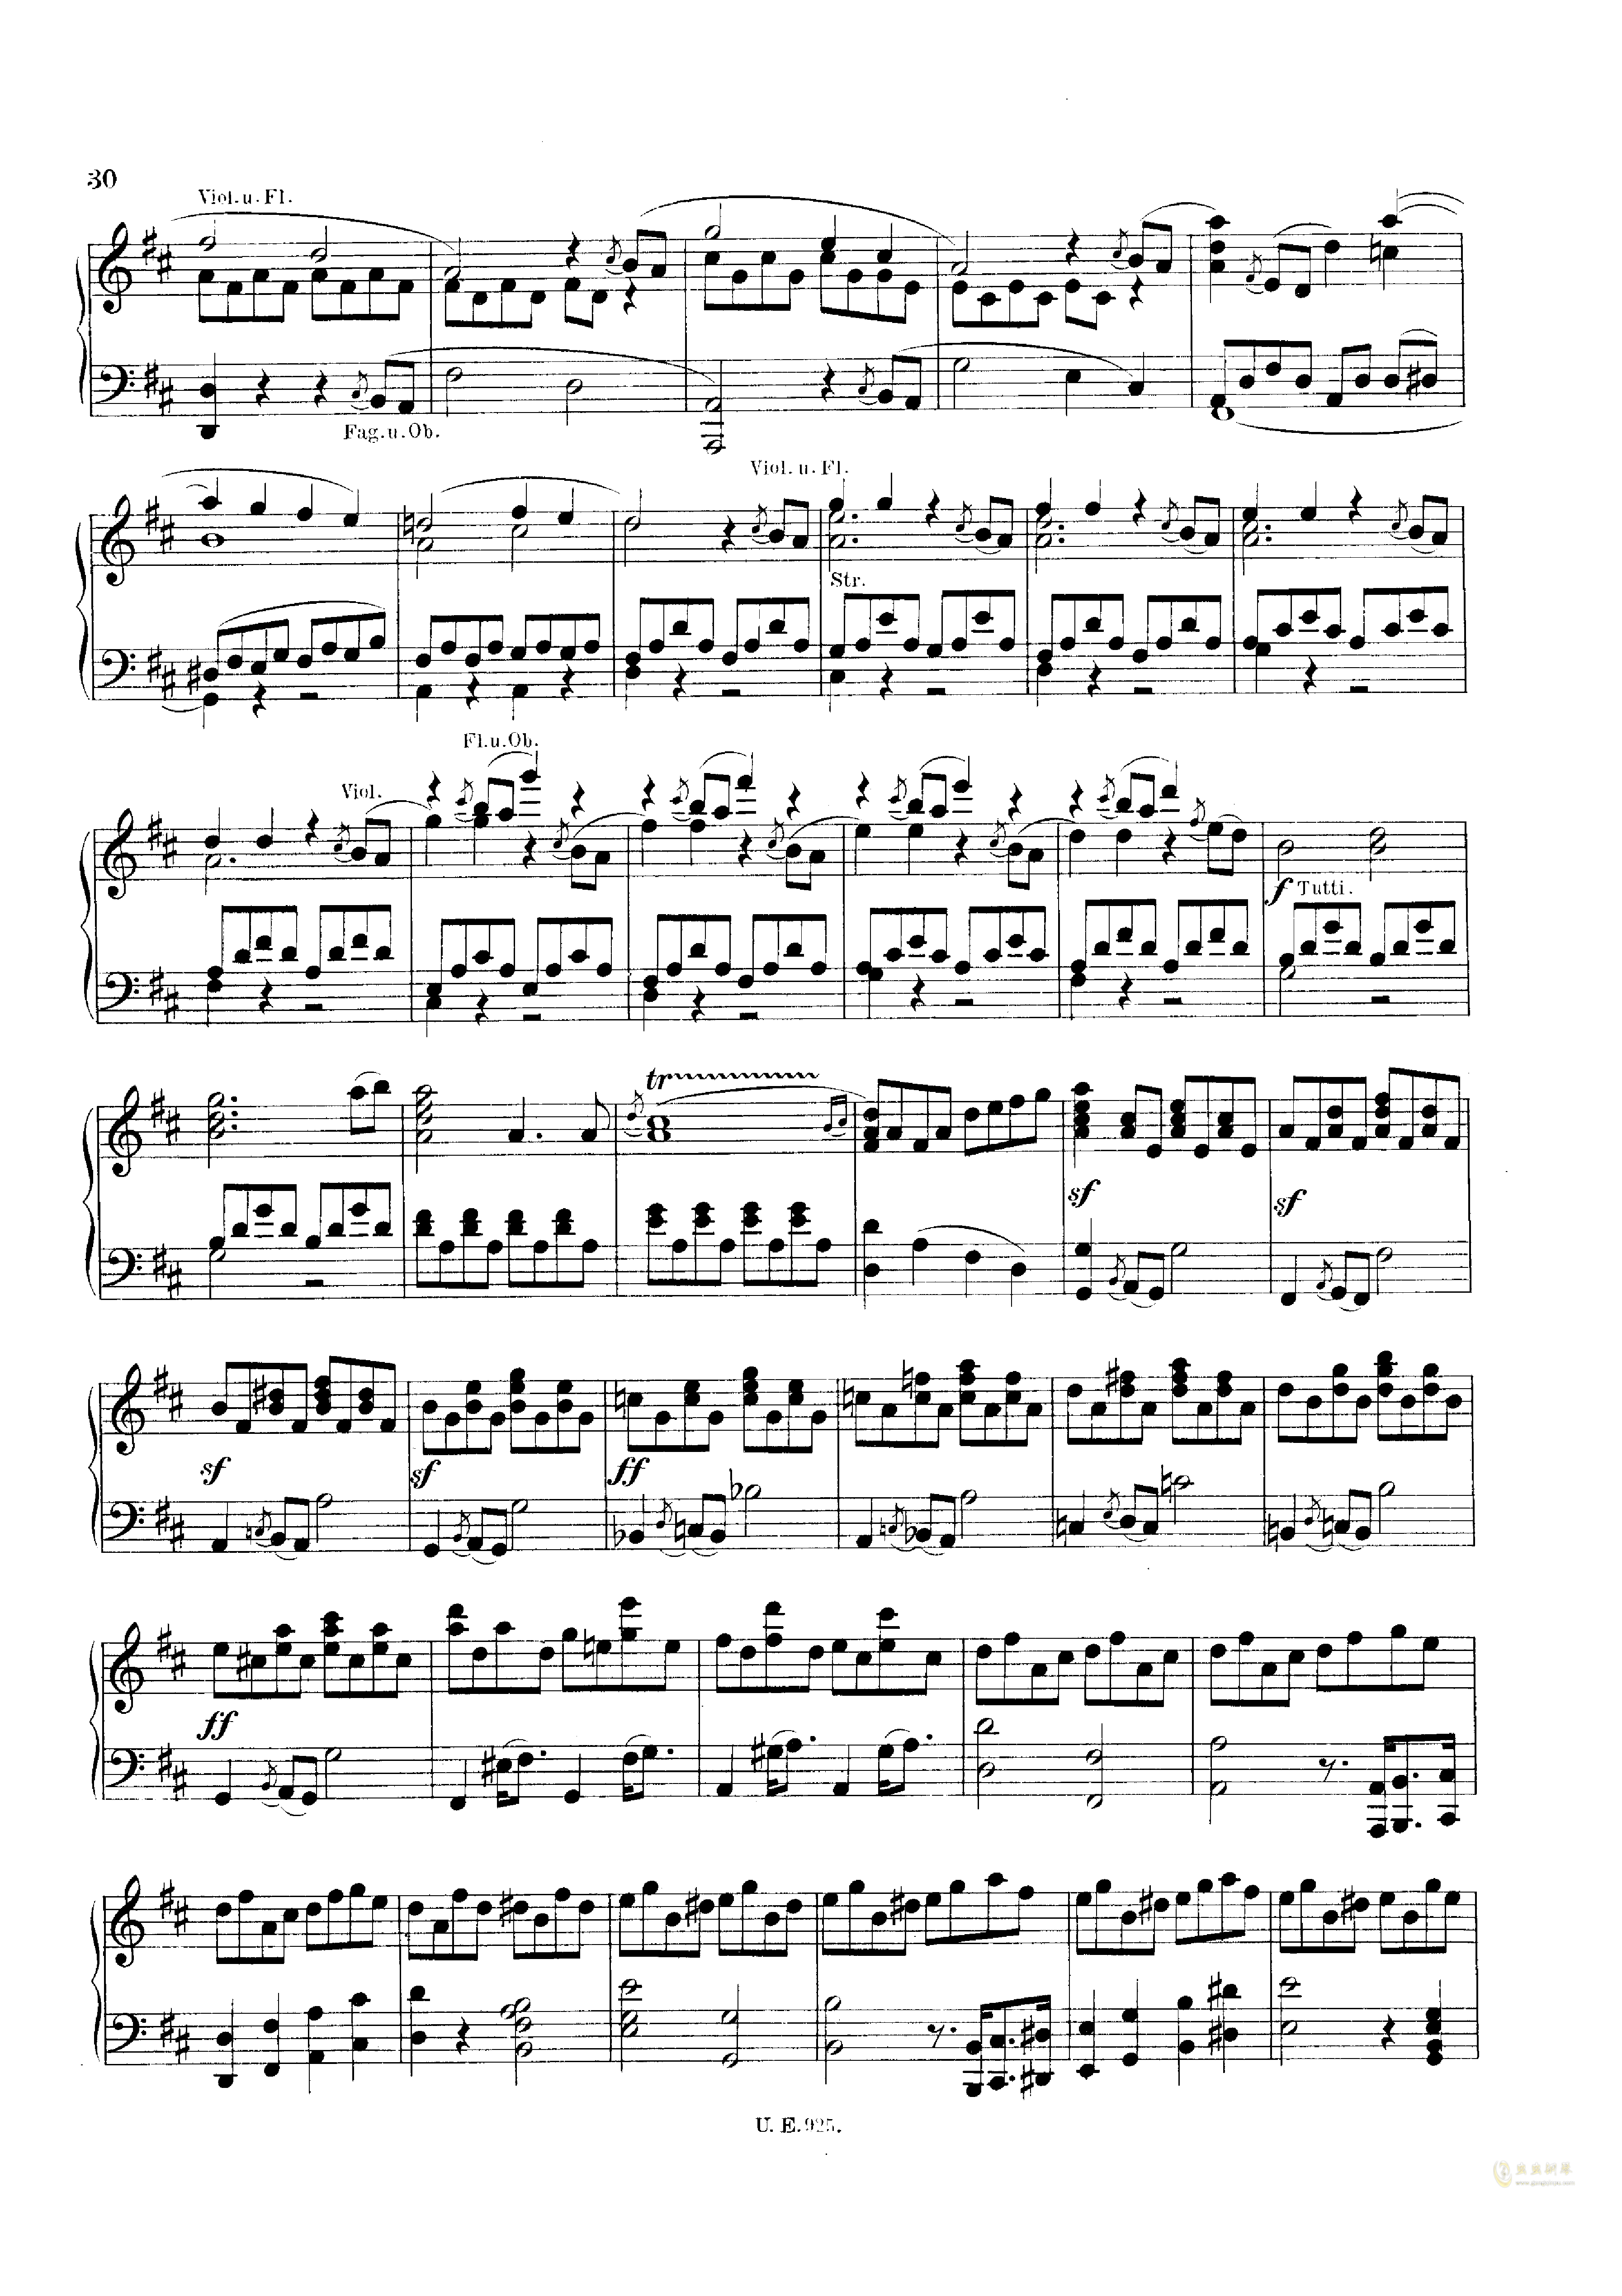 D大调第一交响曲钢琴谱 第30页